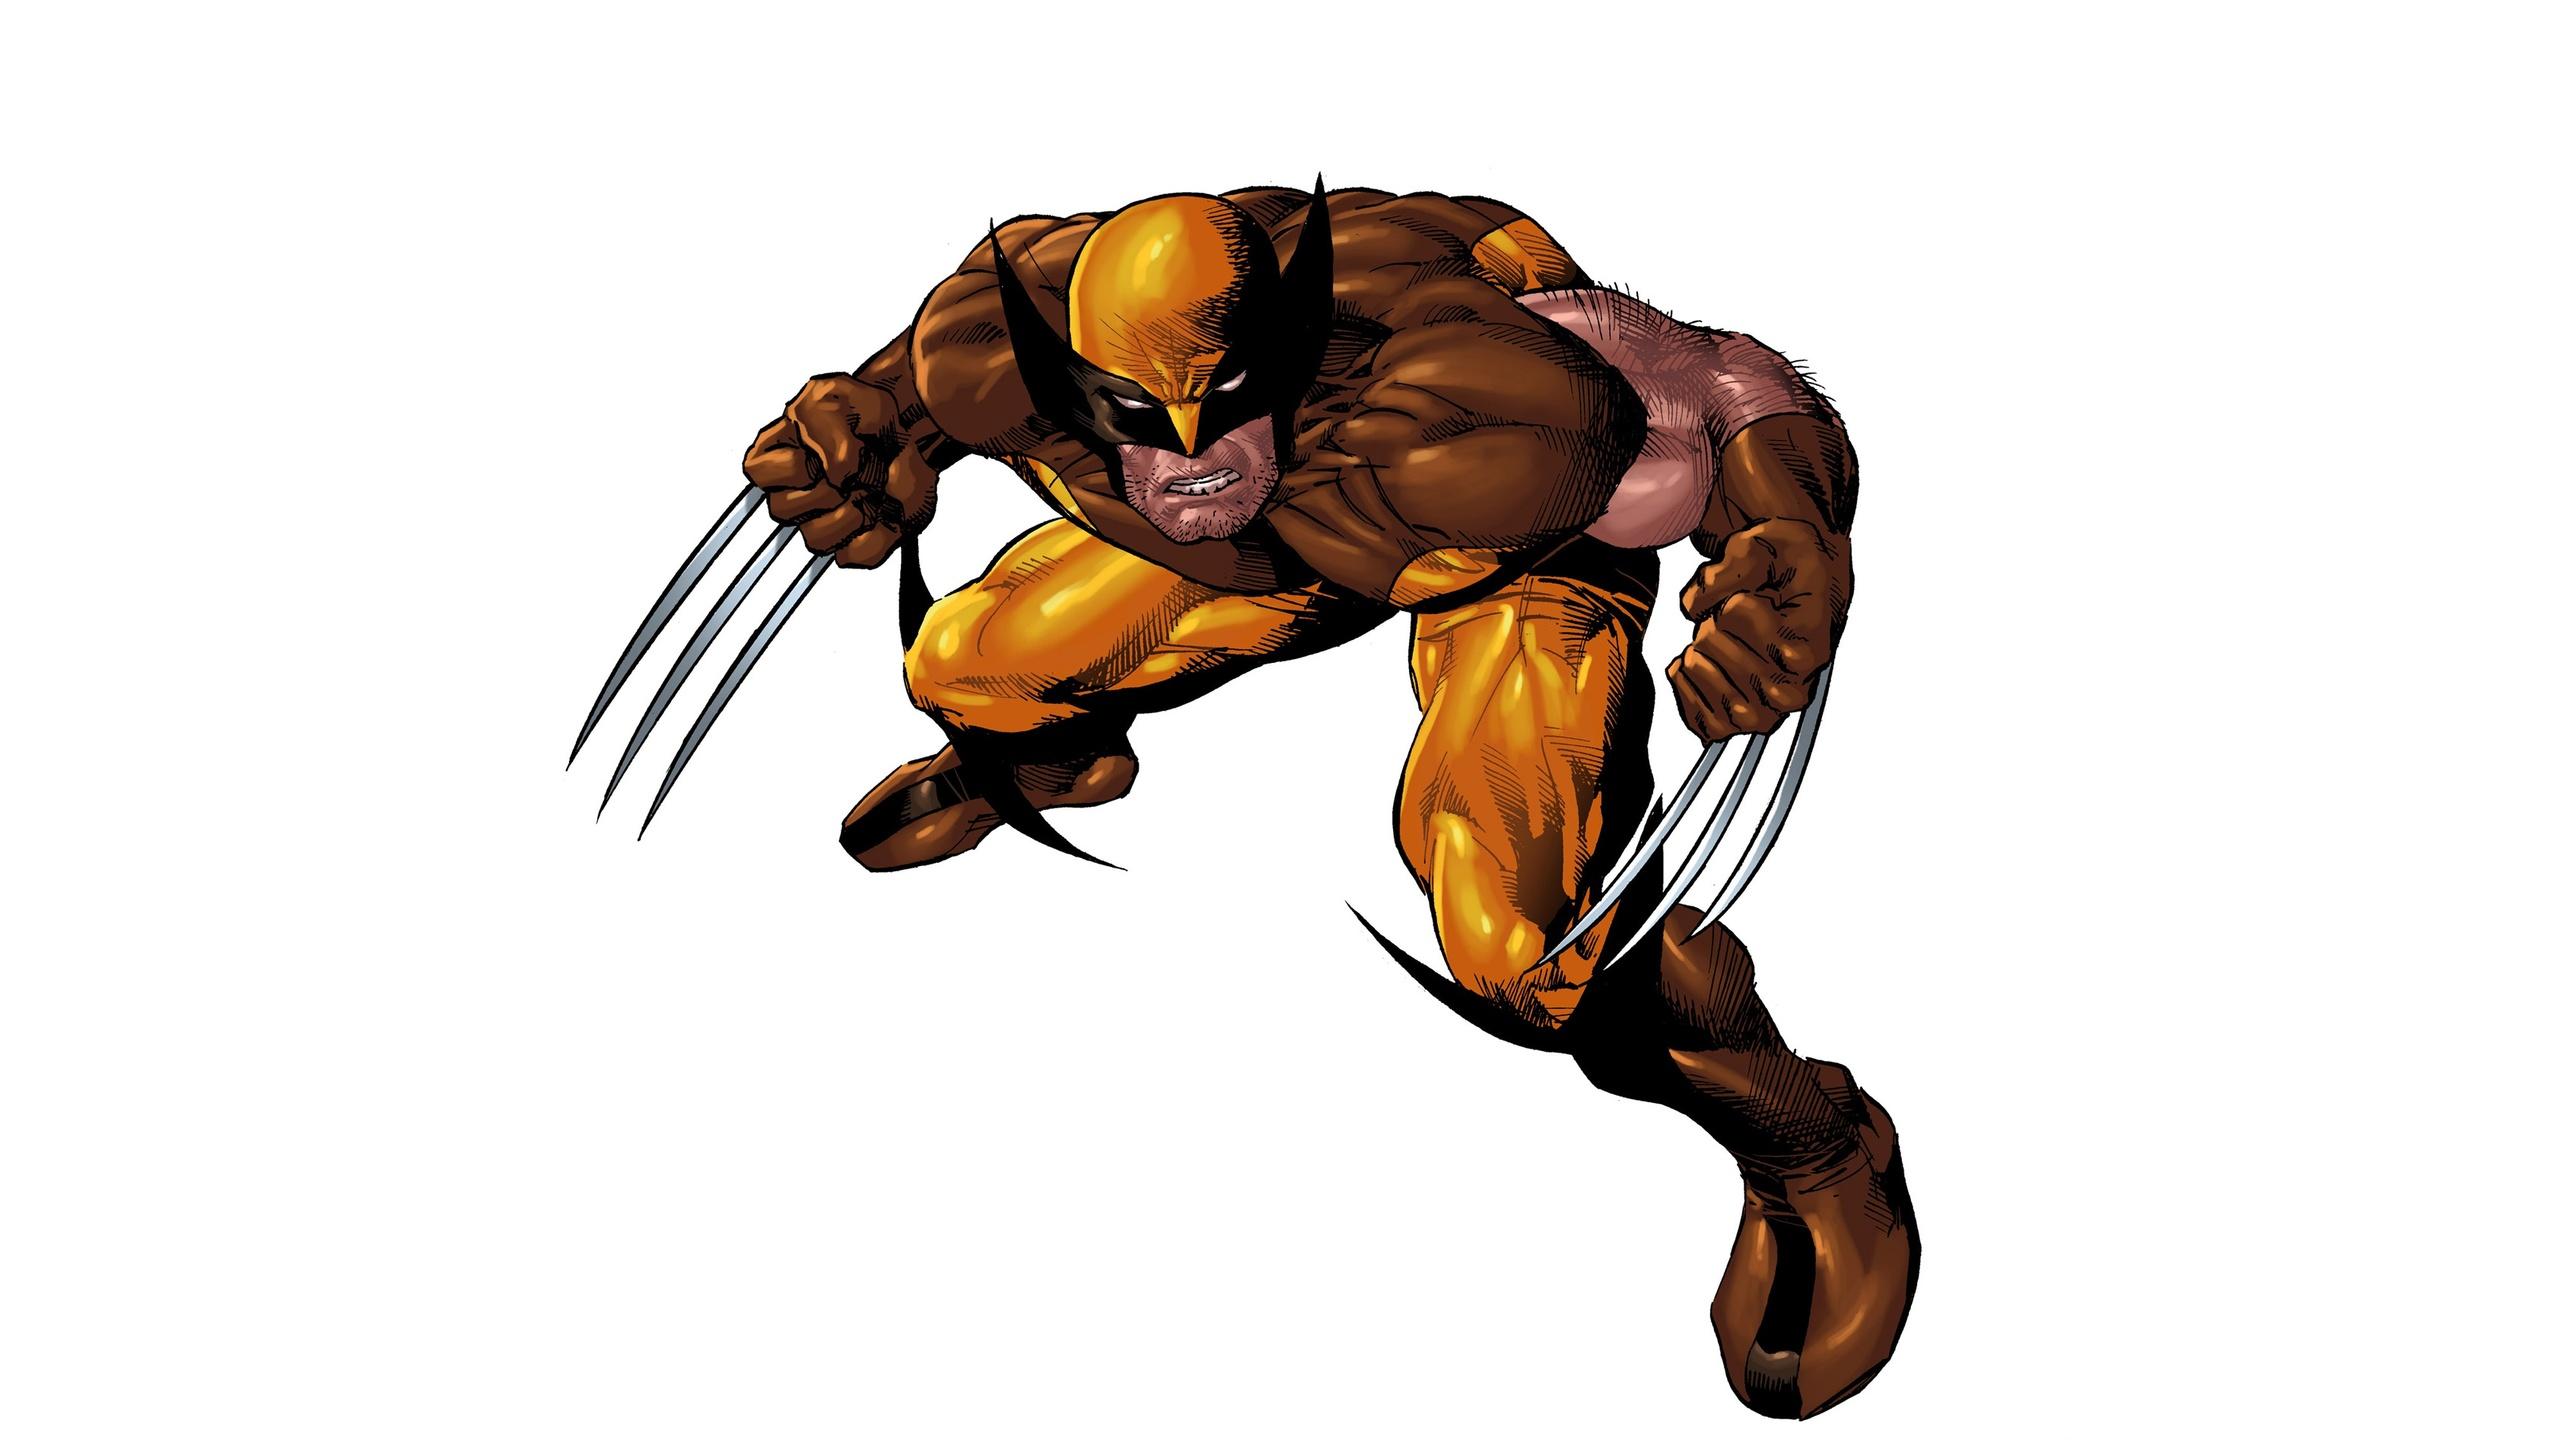 2560x1440 X Men Marvel Comics Wolverine 1440p Resolution Hd 4k